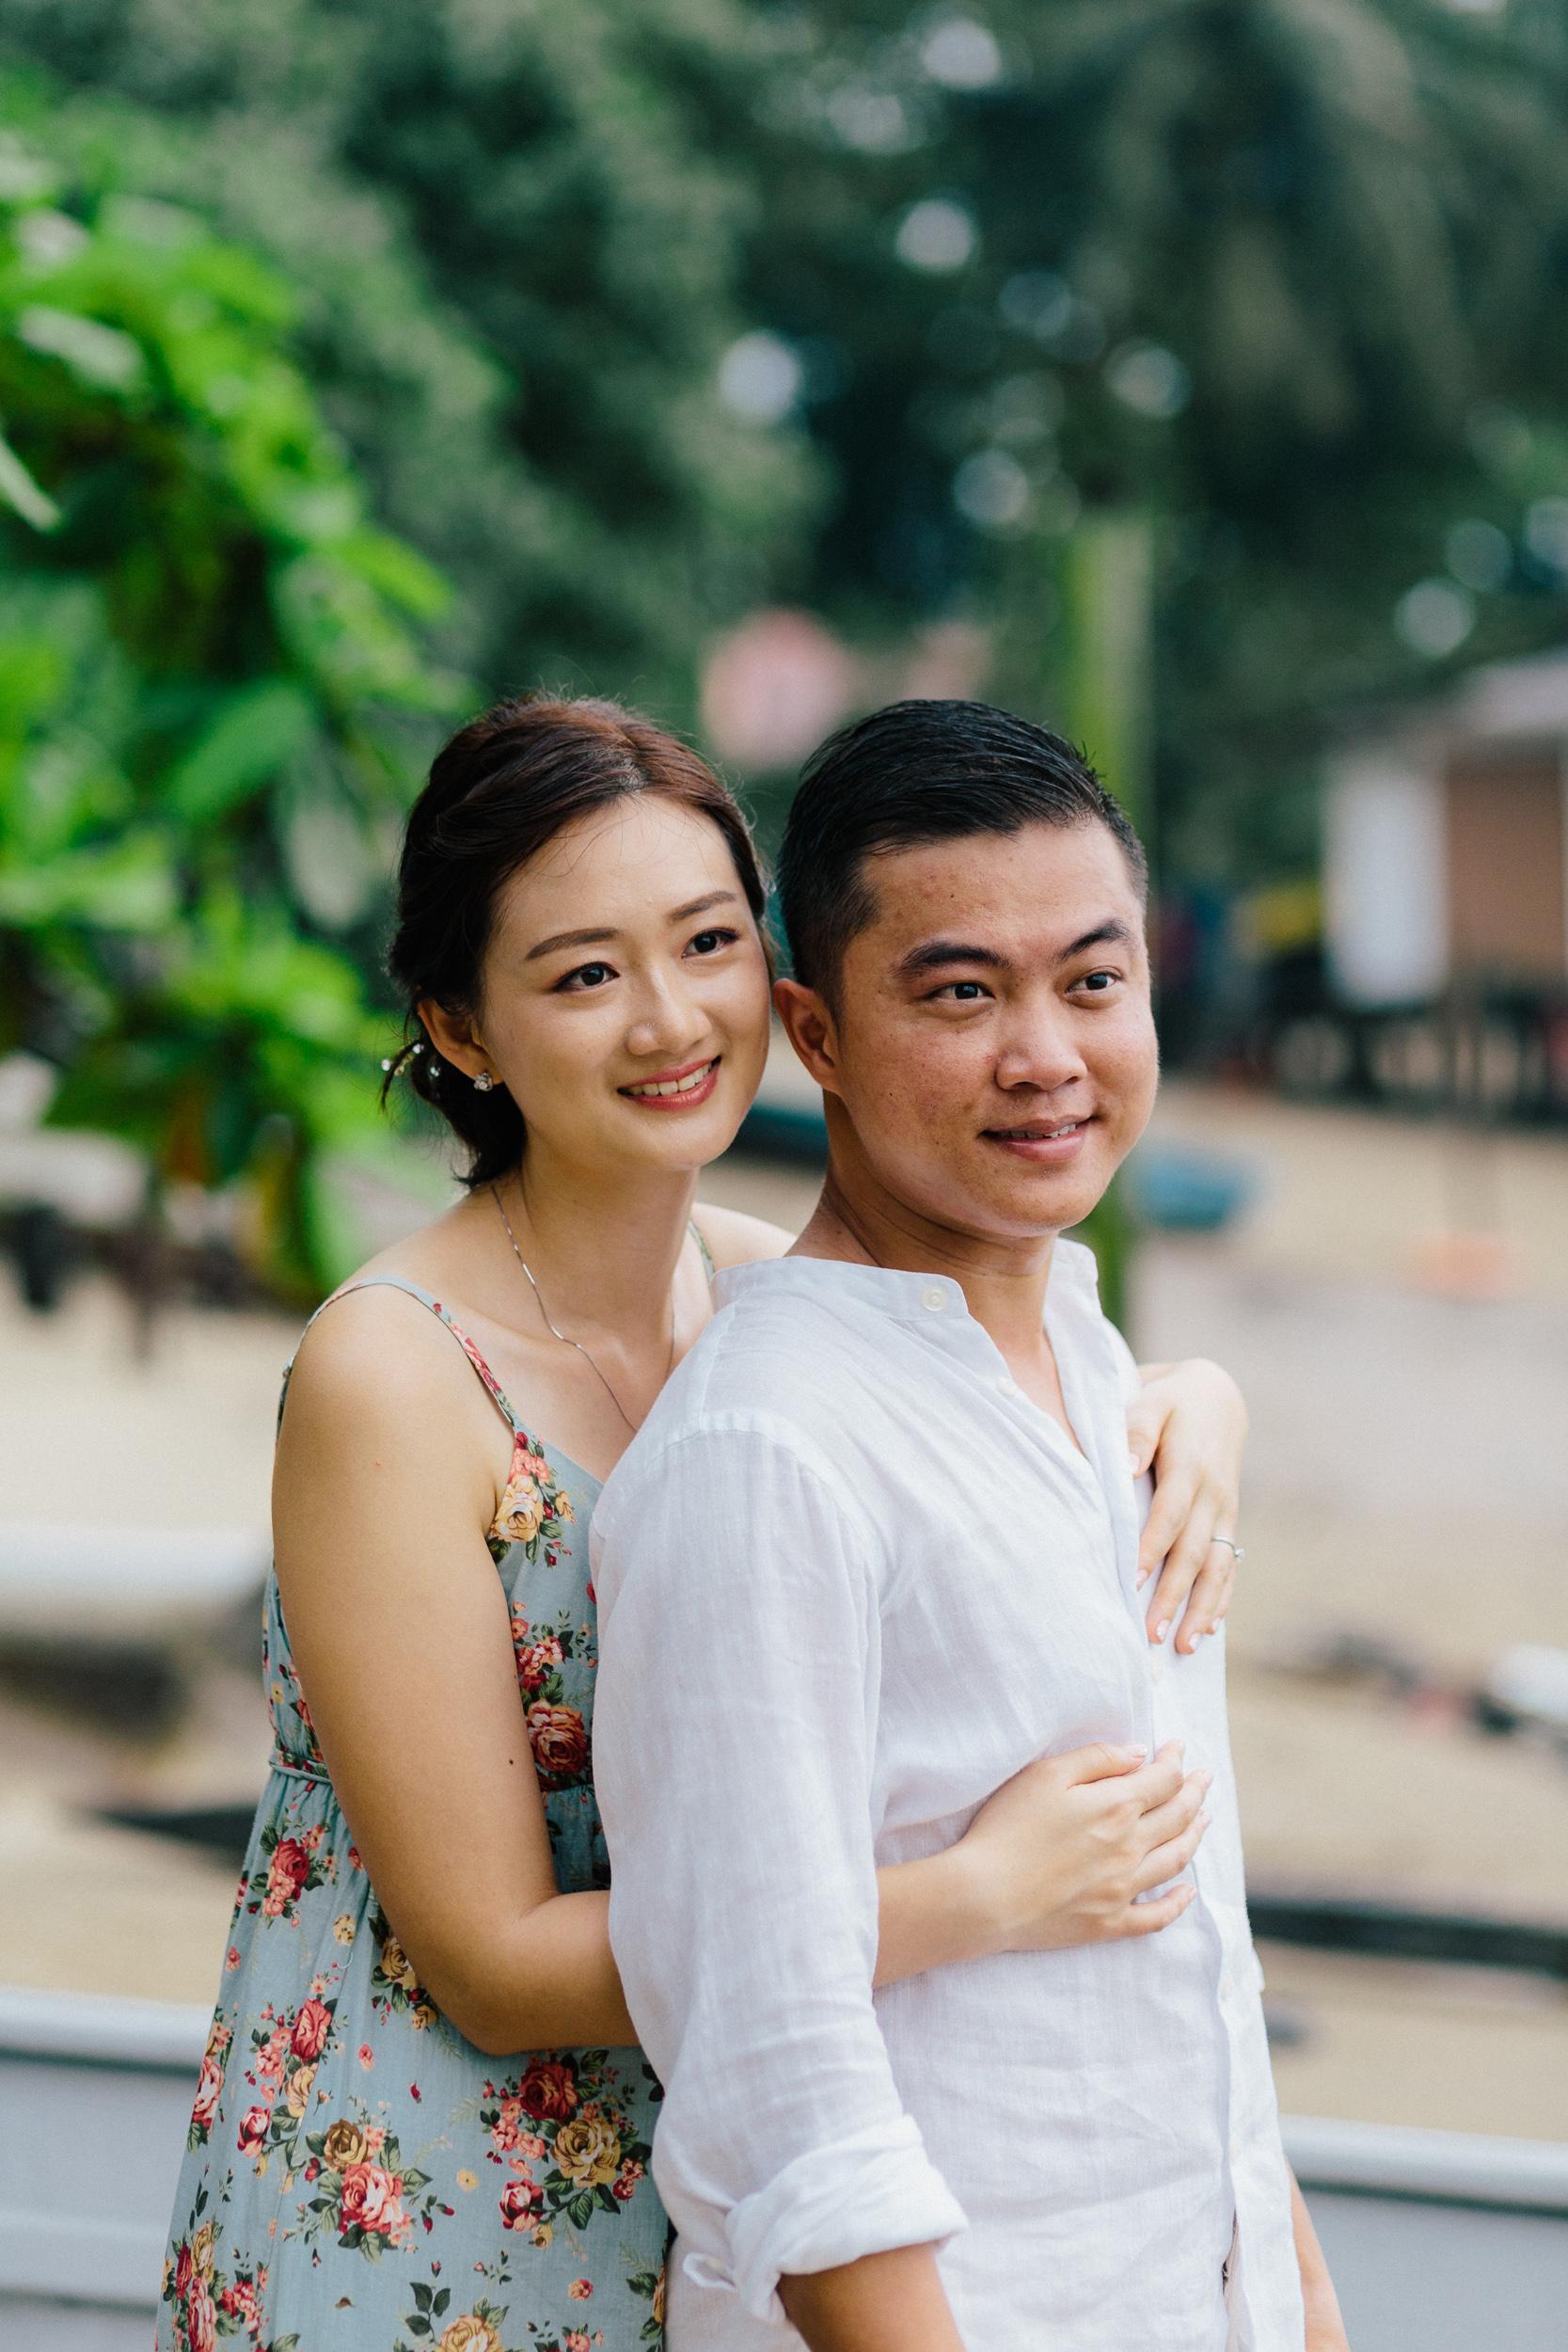 singapore-wedding-photographer-wemadethese-junekit-kingslin-18.jpg